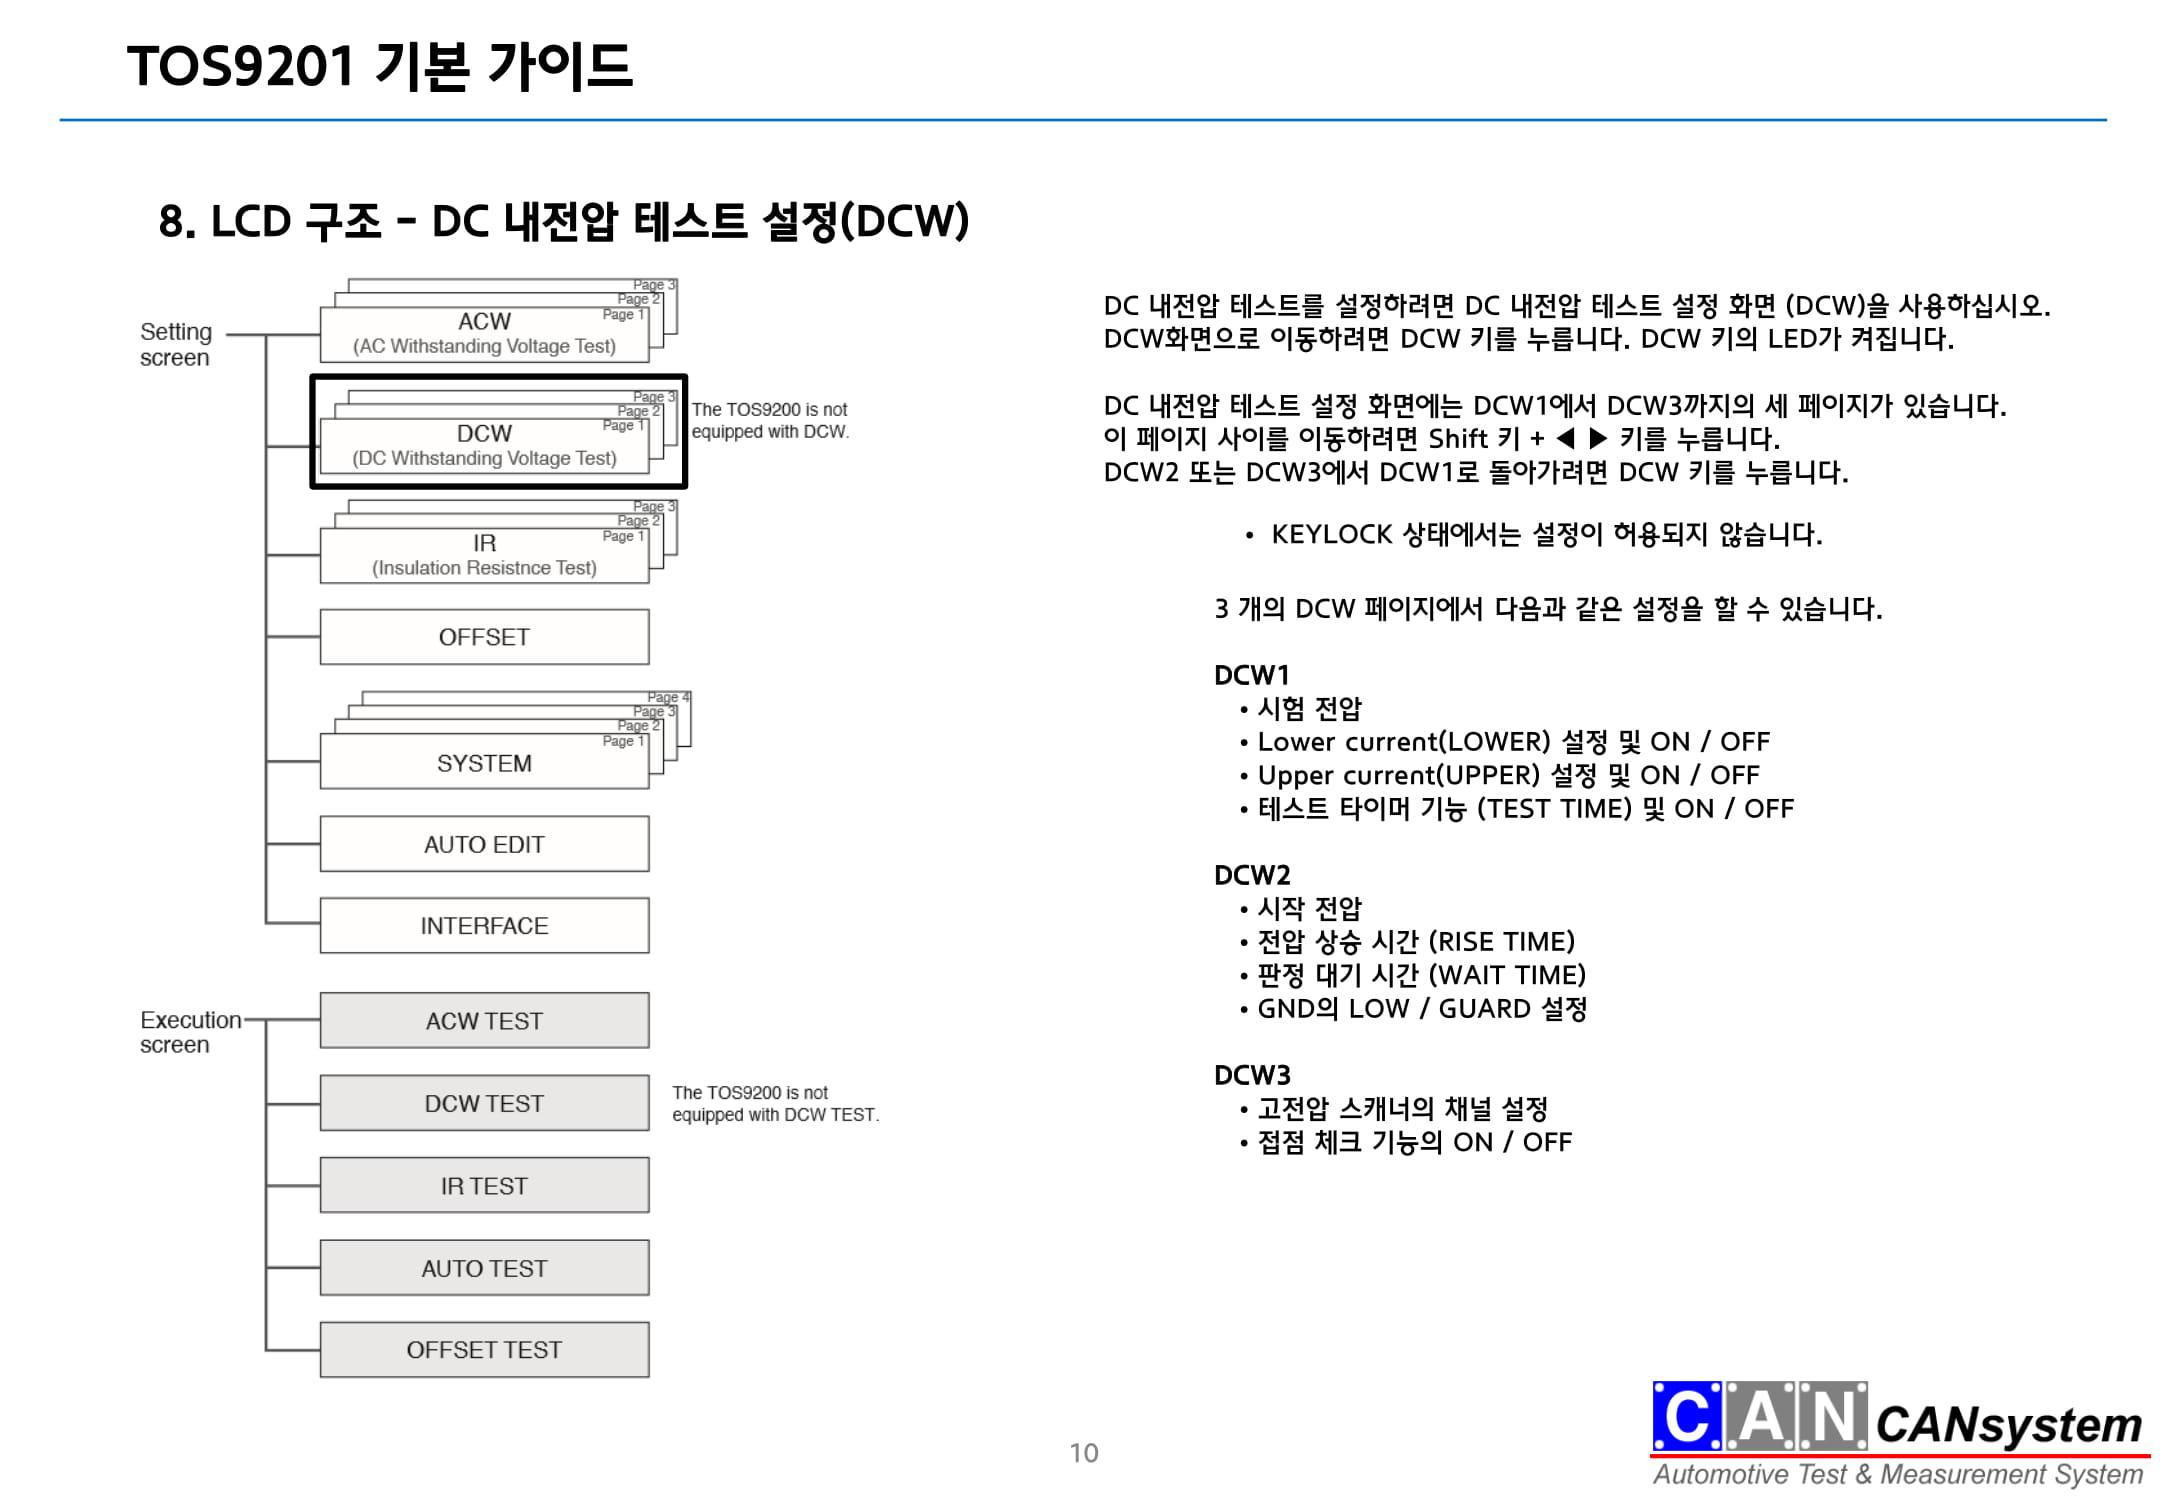 KIKUSUI TOS9201 국문 이용가이드-10.jpg